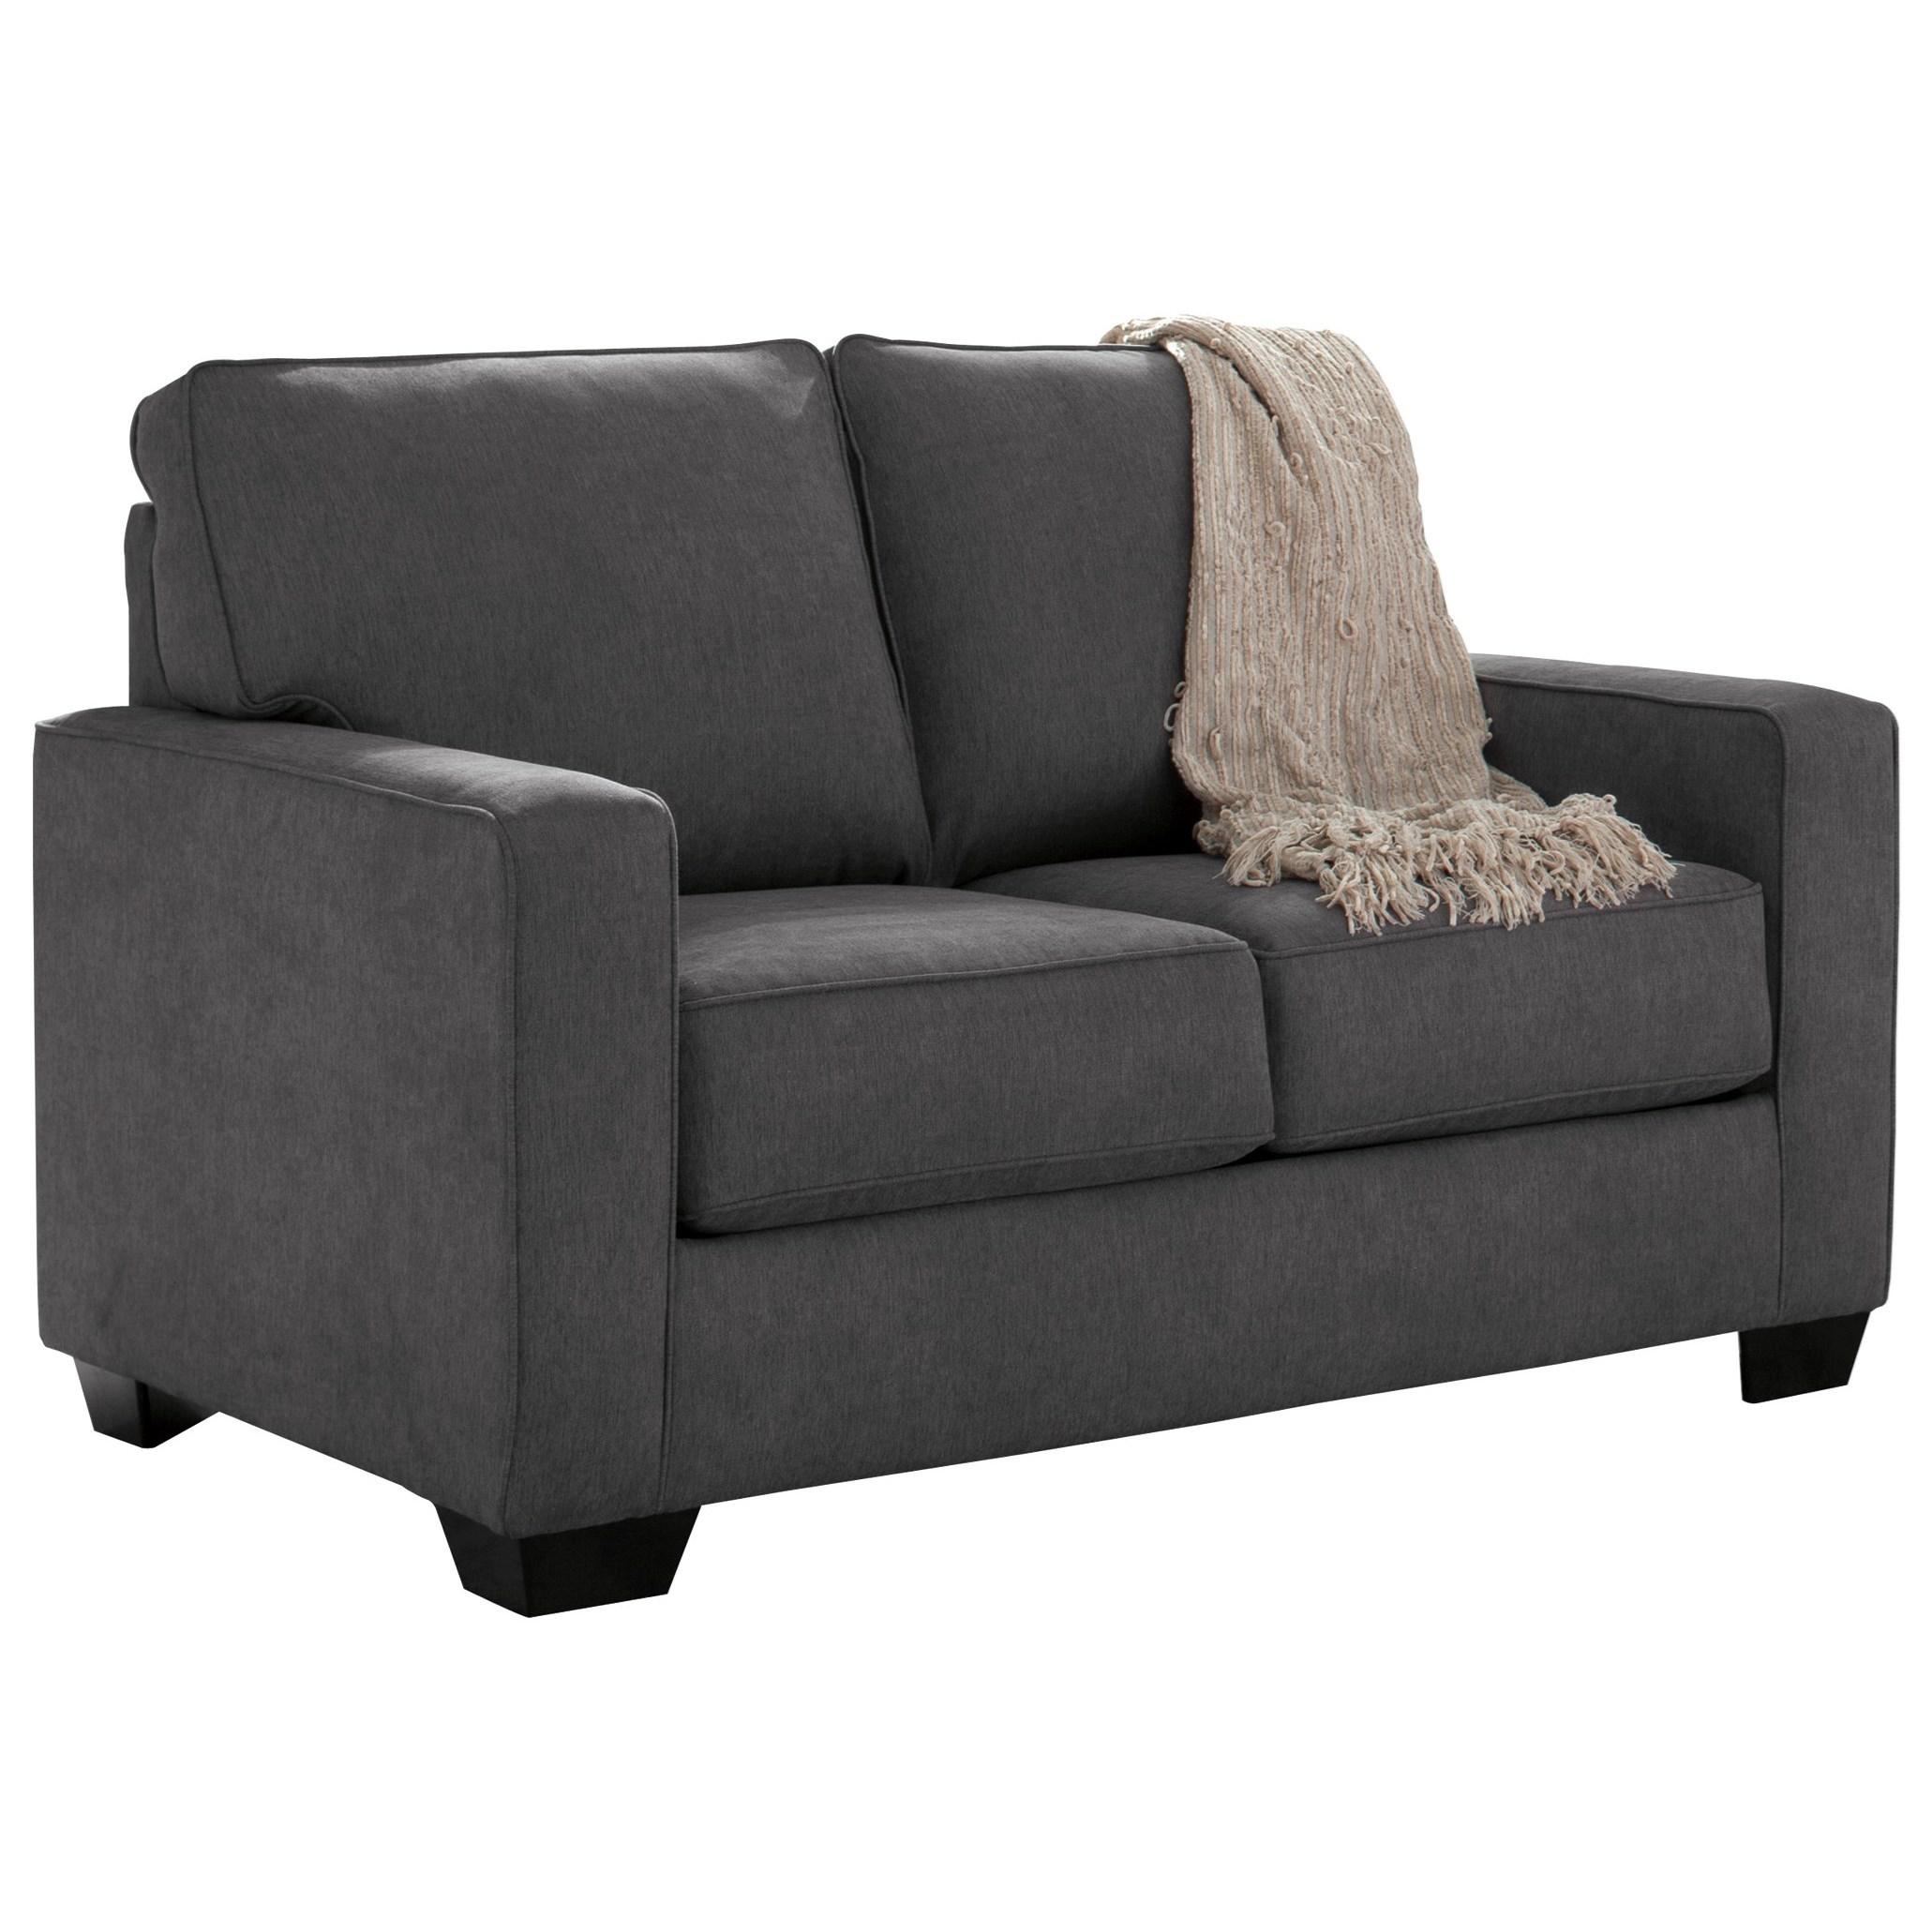 Signature Ziggy Twin Sofa Sleeper With Memory Foam Mattress Walker S Furniture Sleeper Sofas